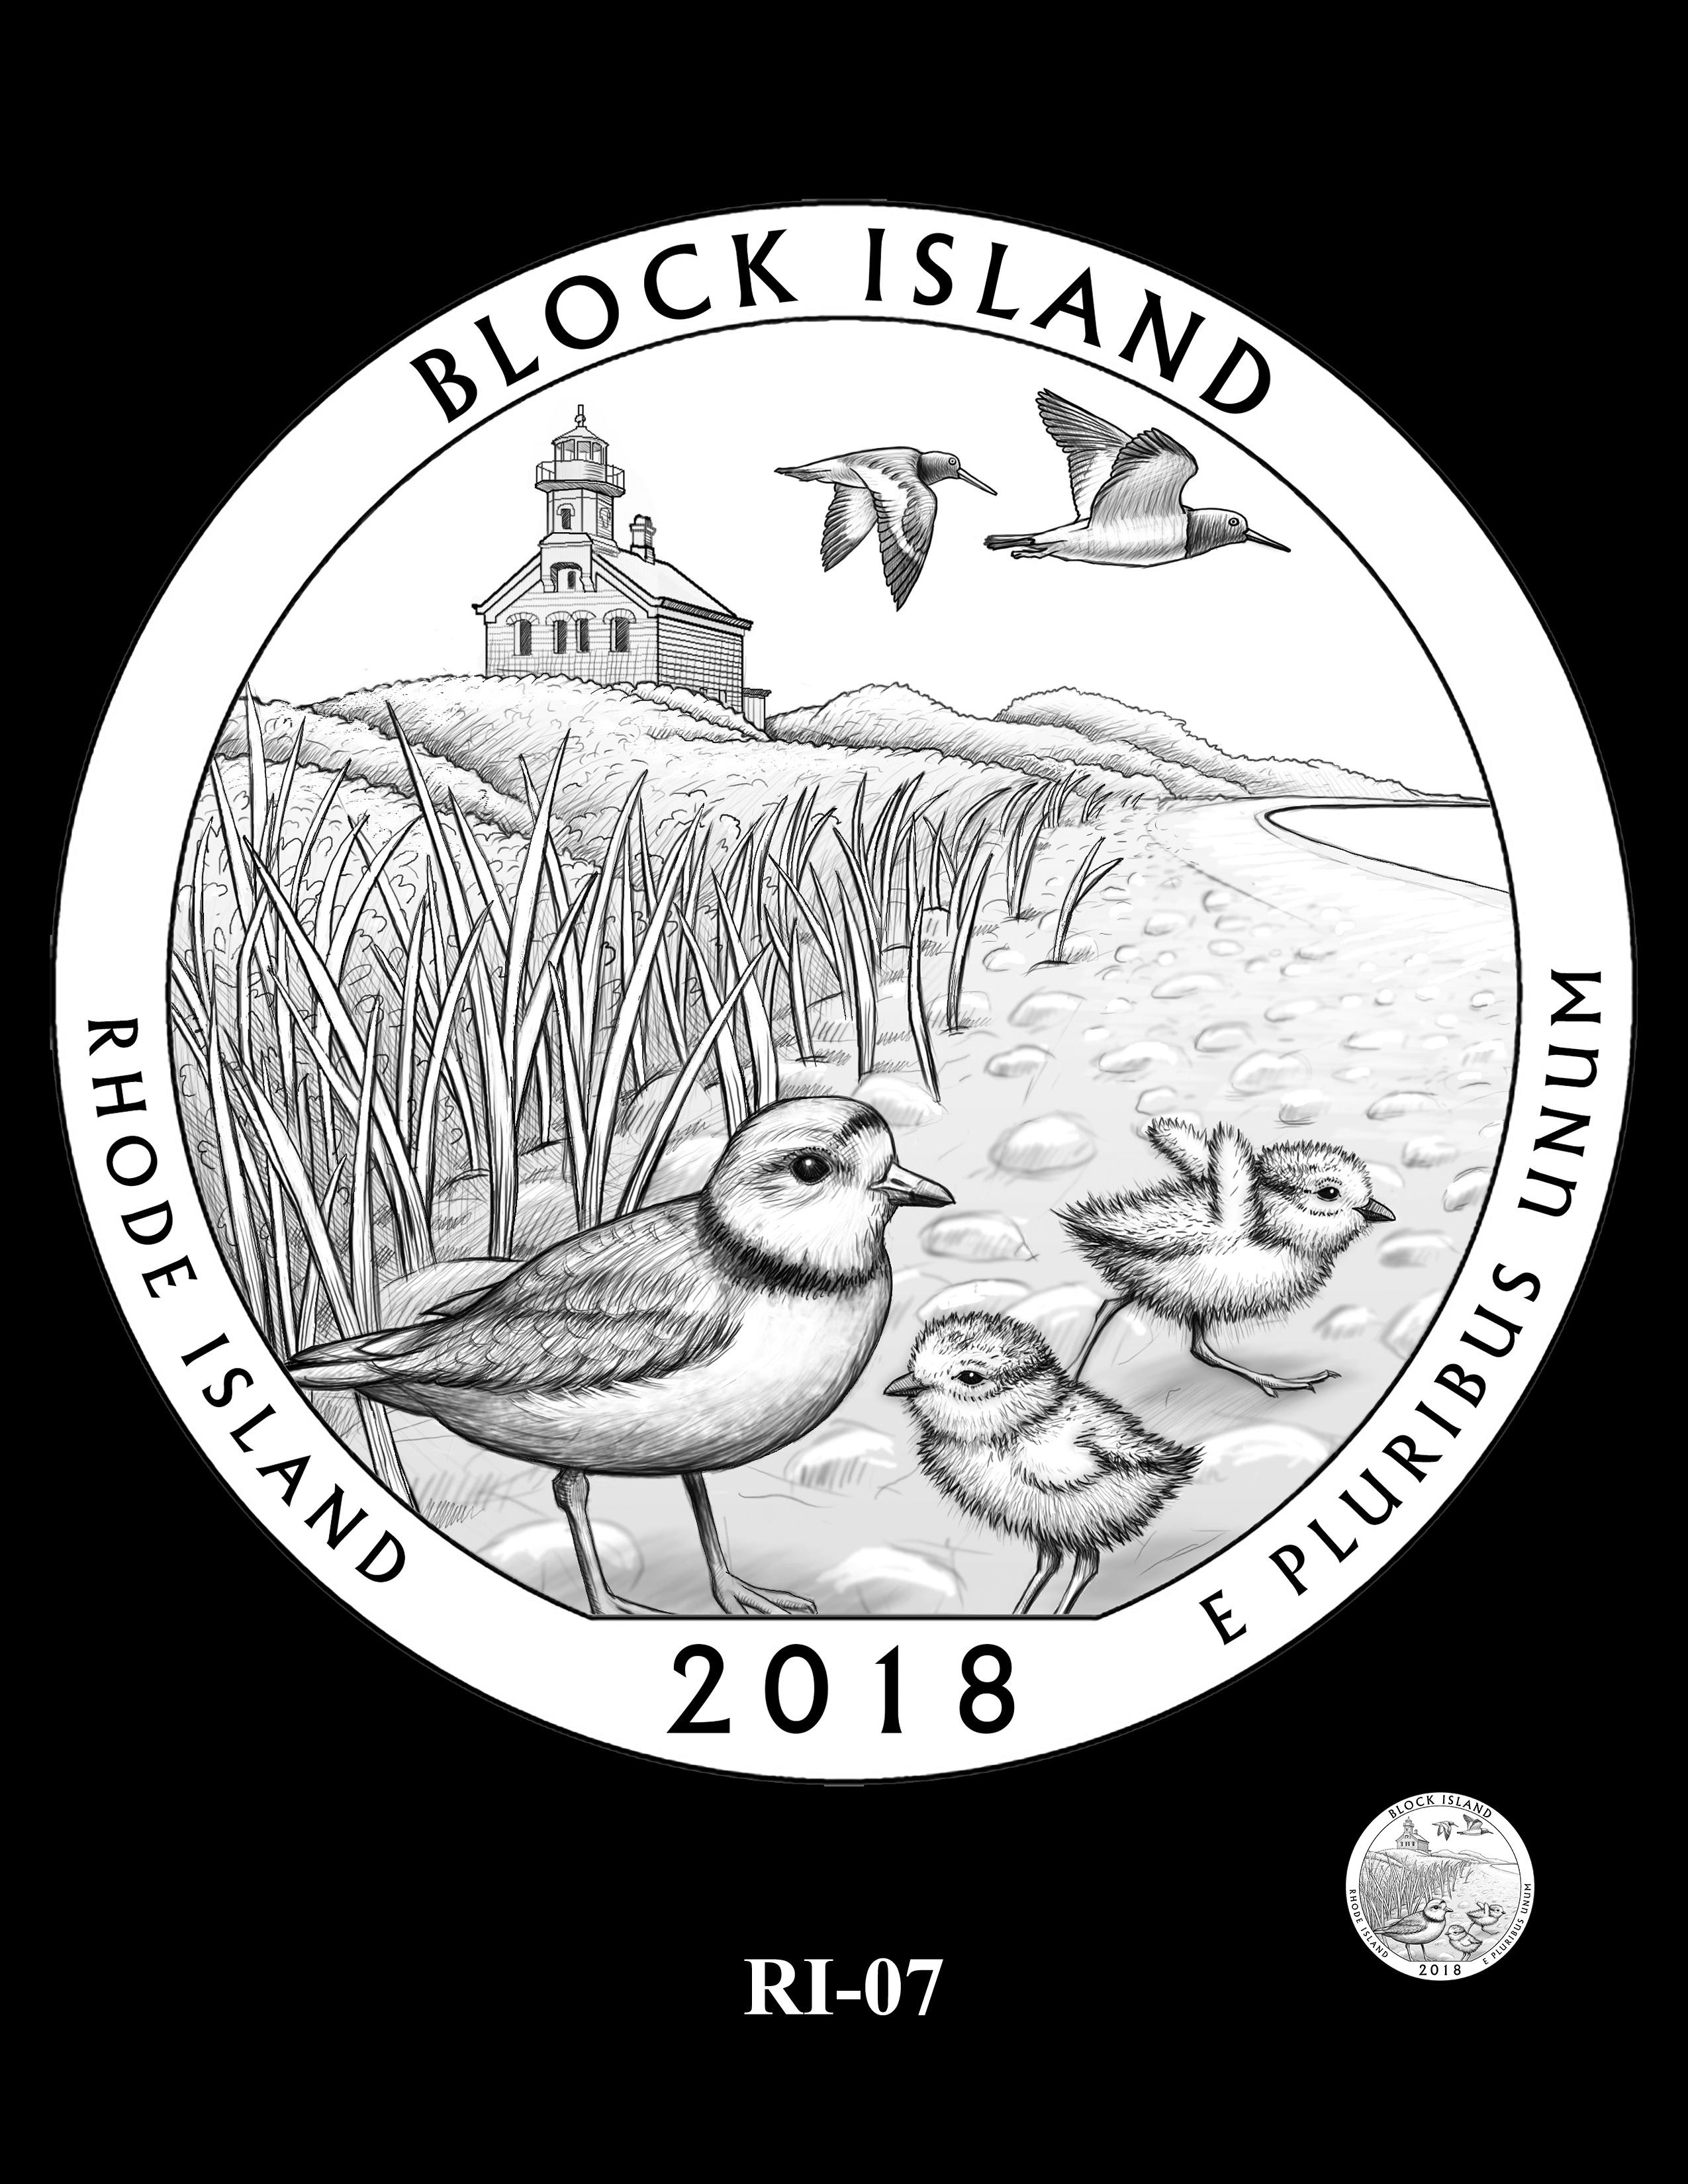 RI-07 -- 2018 America the Beautiful® Quarters Program